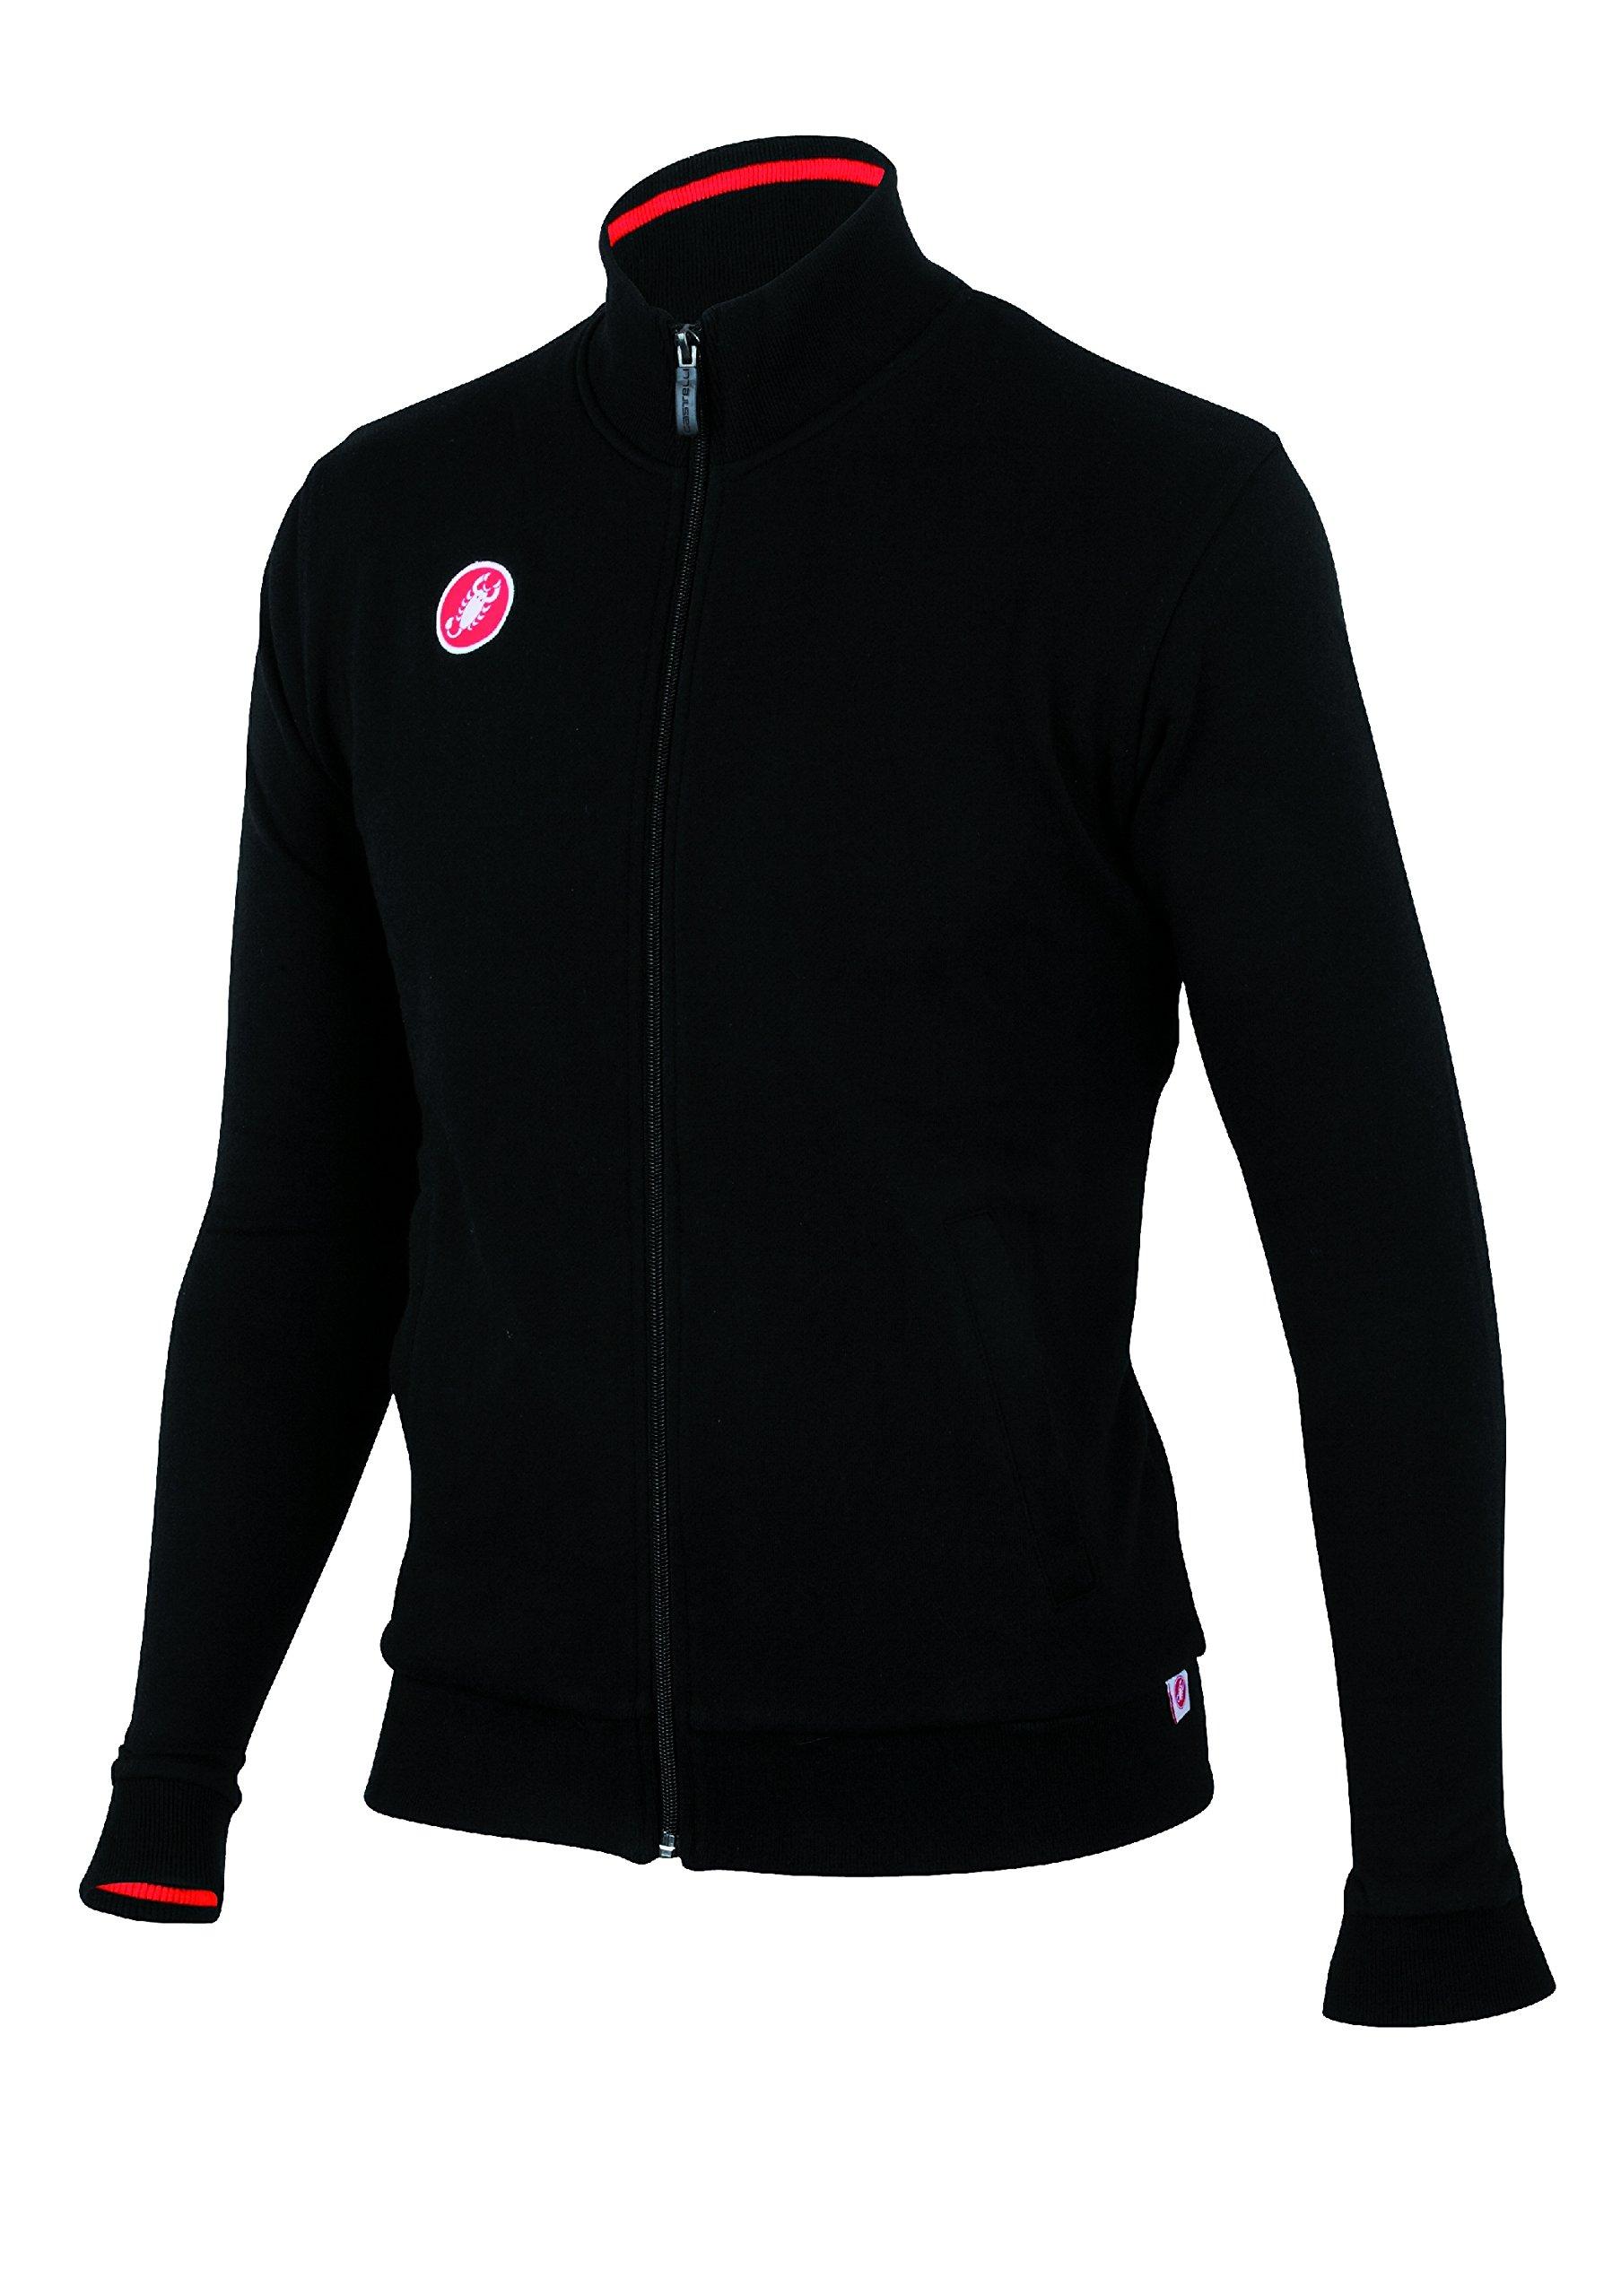 Castelli Race Day Track Jacket Black, Small - Men's